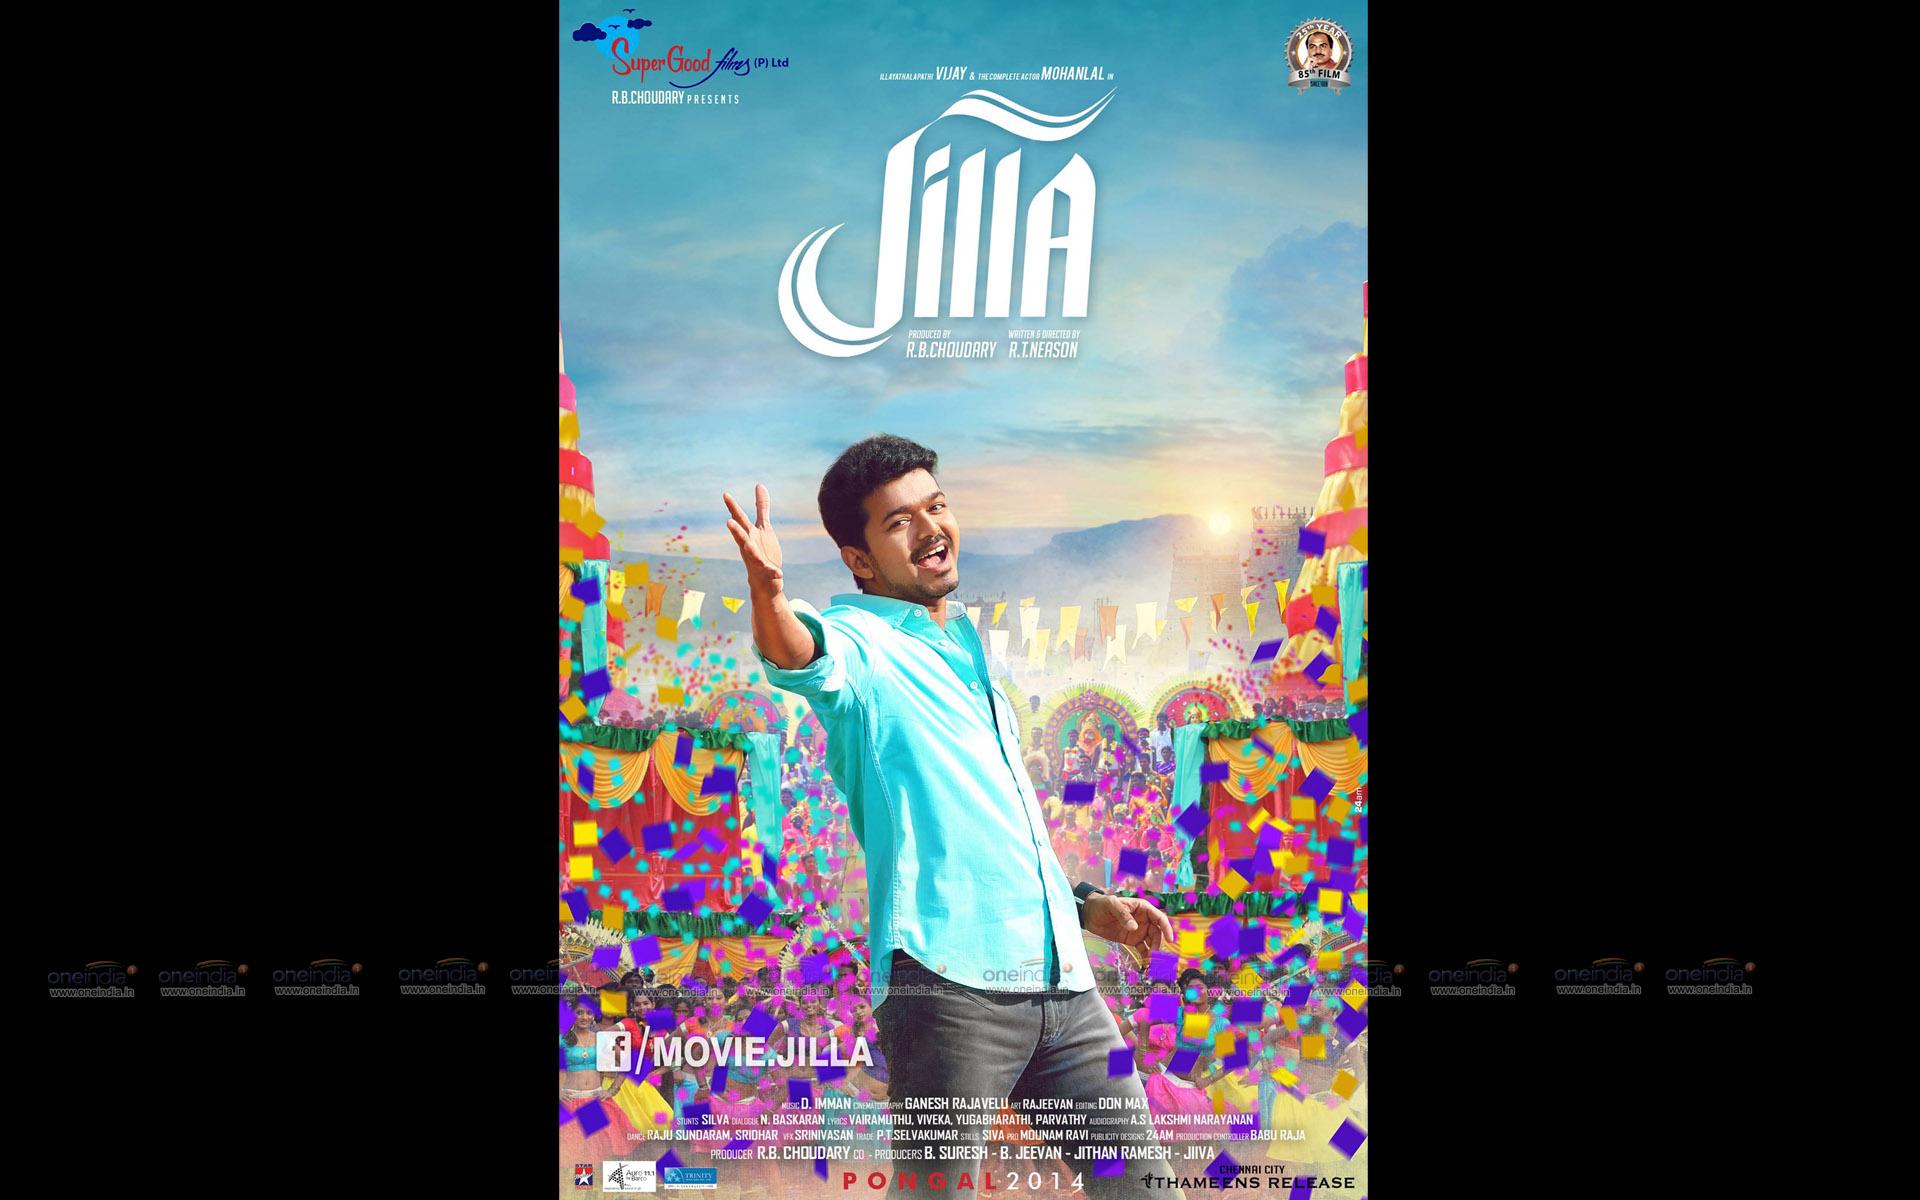 jilla movie wallpaper -13039 - jilla images, pictures, photos, icons